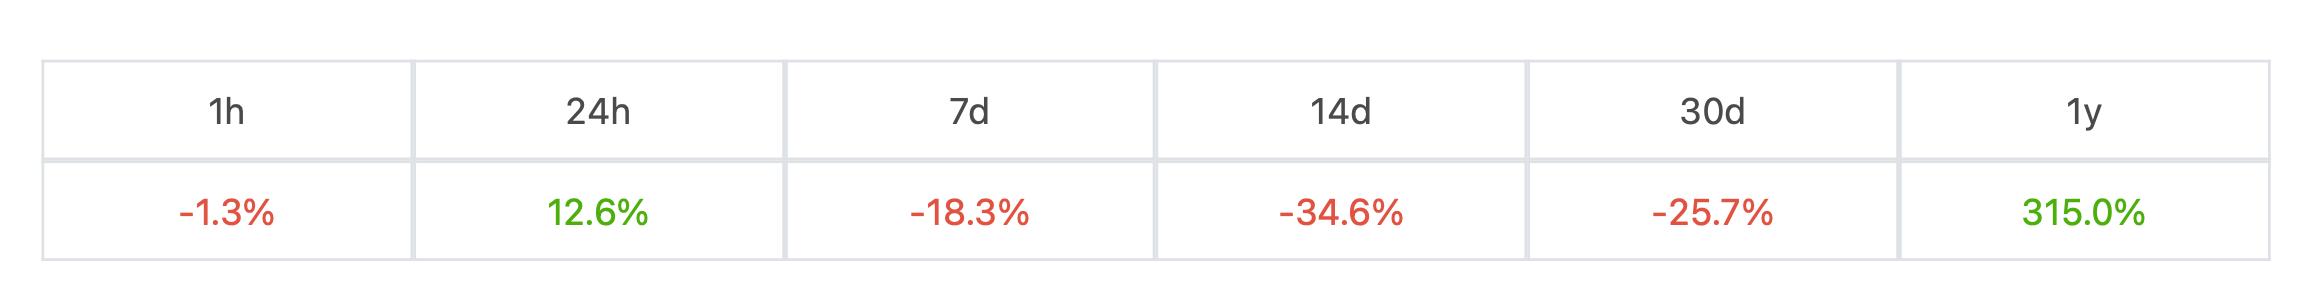 биткоин курс рост падение